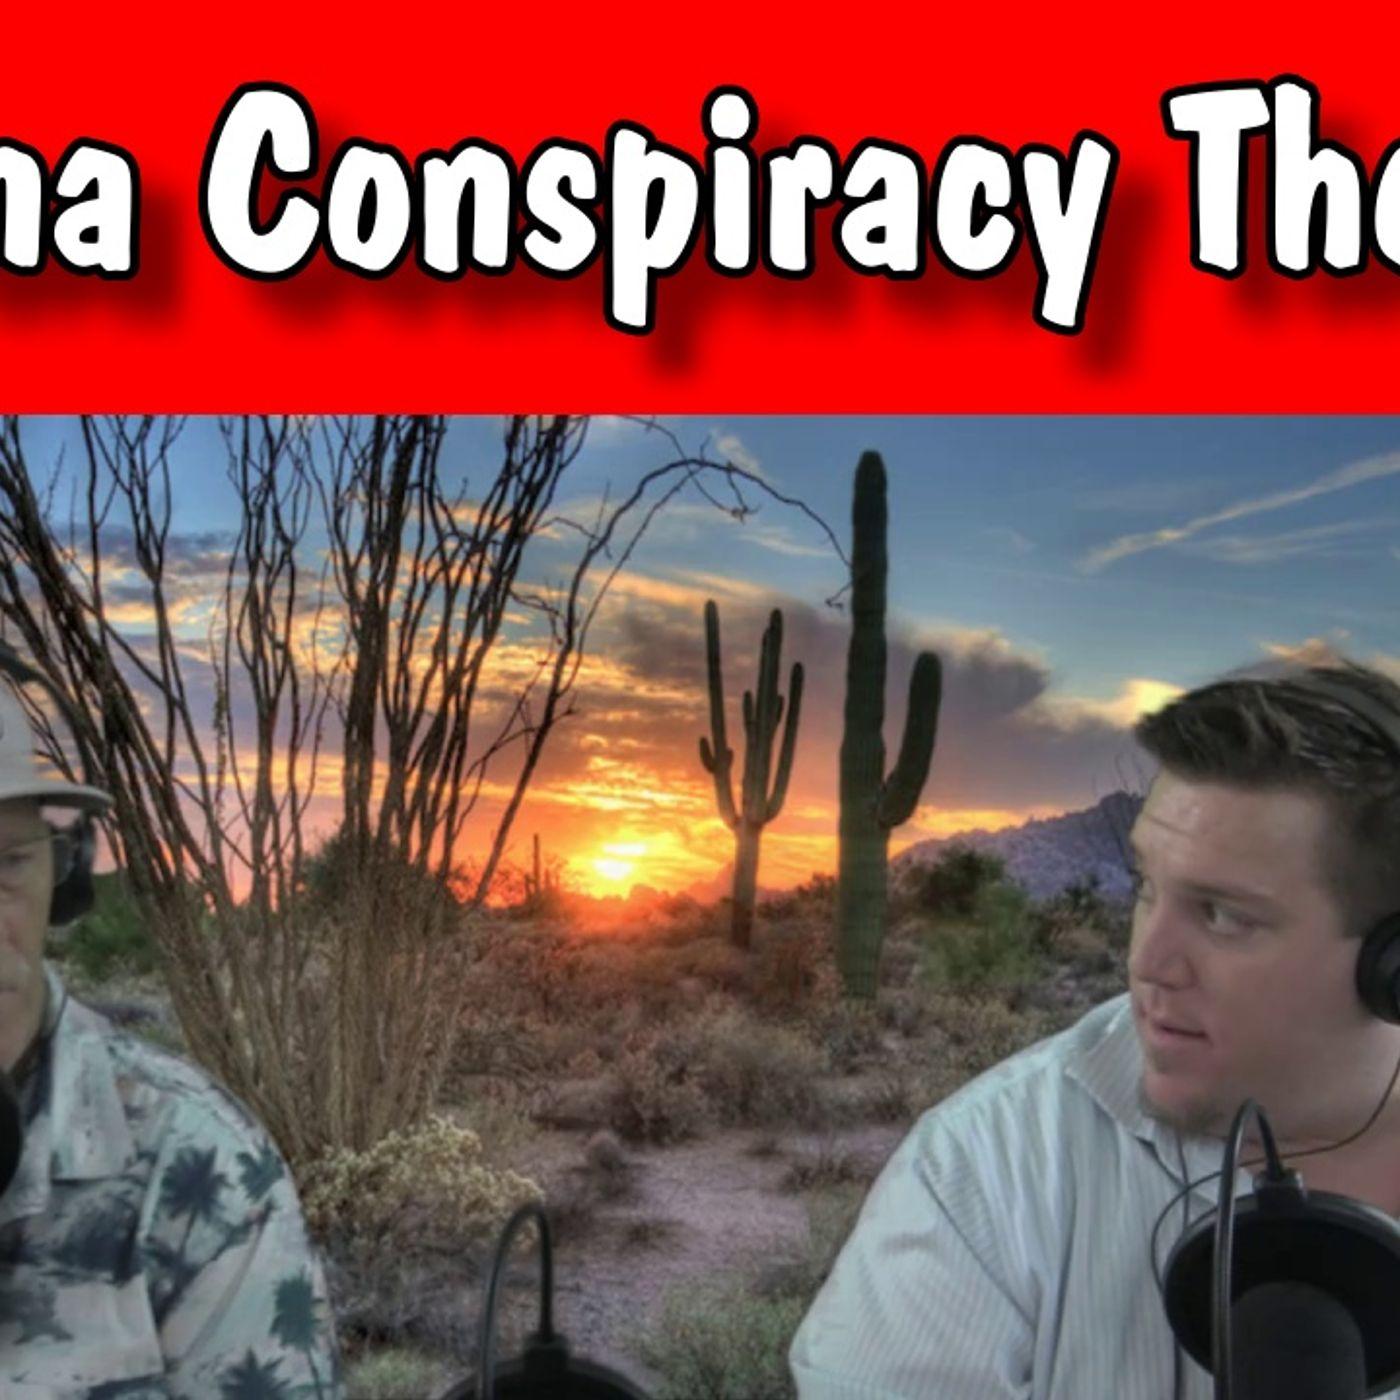 Arizona Conspiracy Theories & Everyday Living, with Rob & Derek, Arizona Talk Radio 60